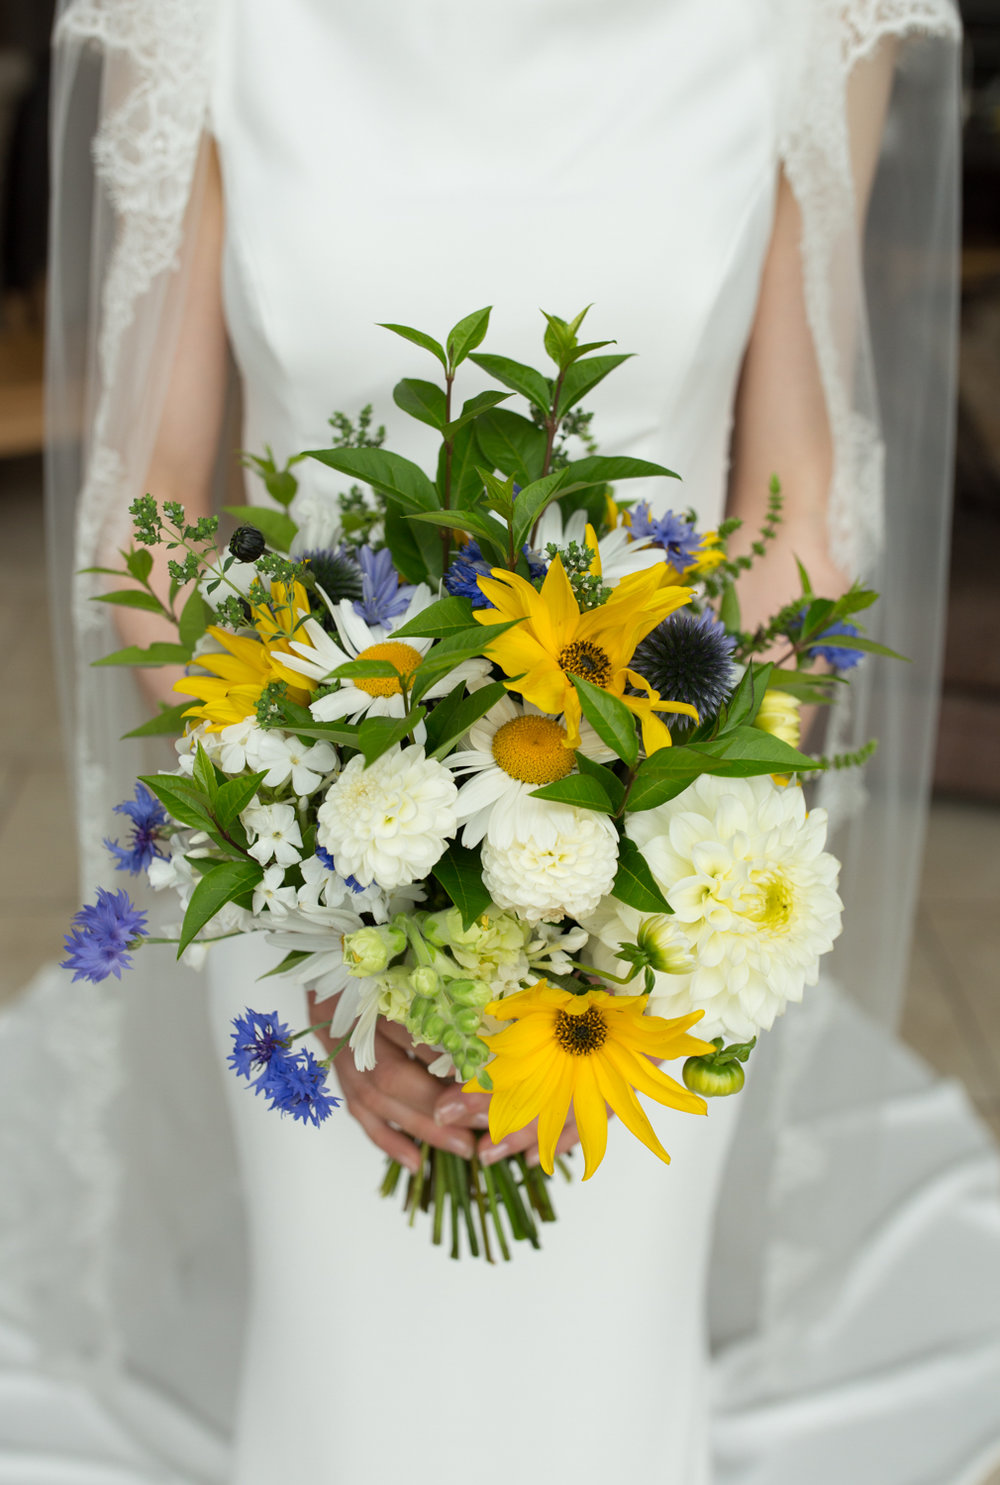 wedding photographer Aberdeen, sakura florist Alford, wedding photography Aberdeen